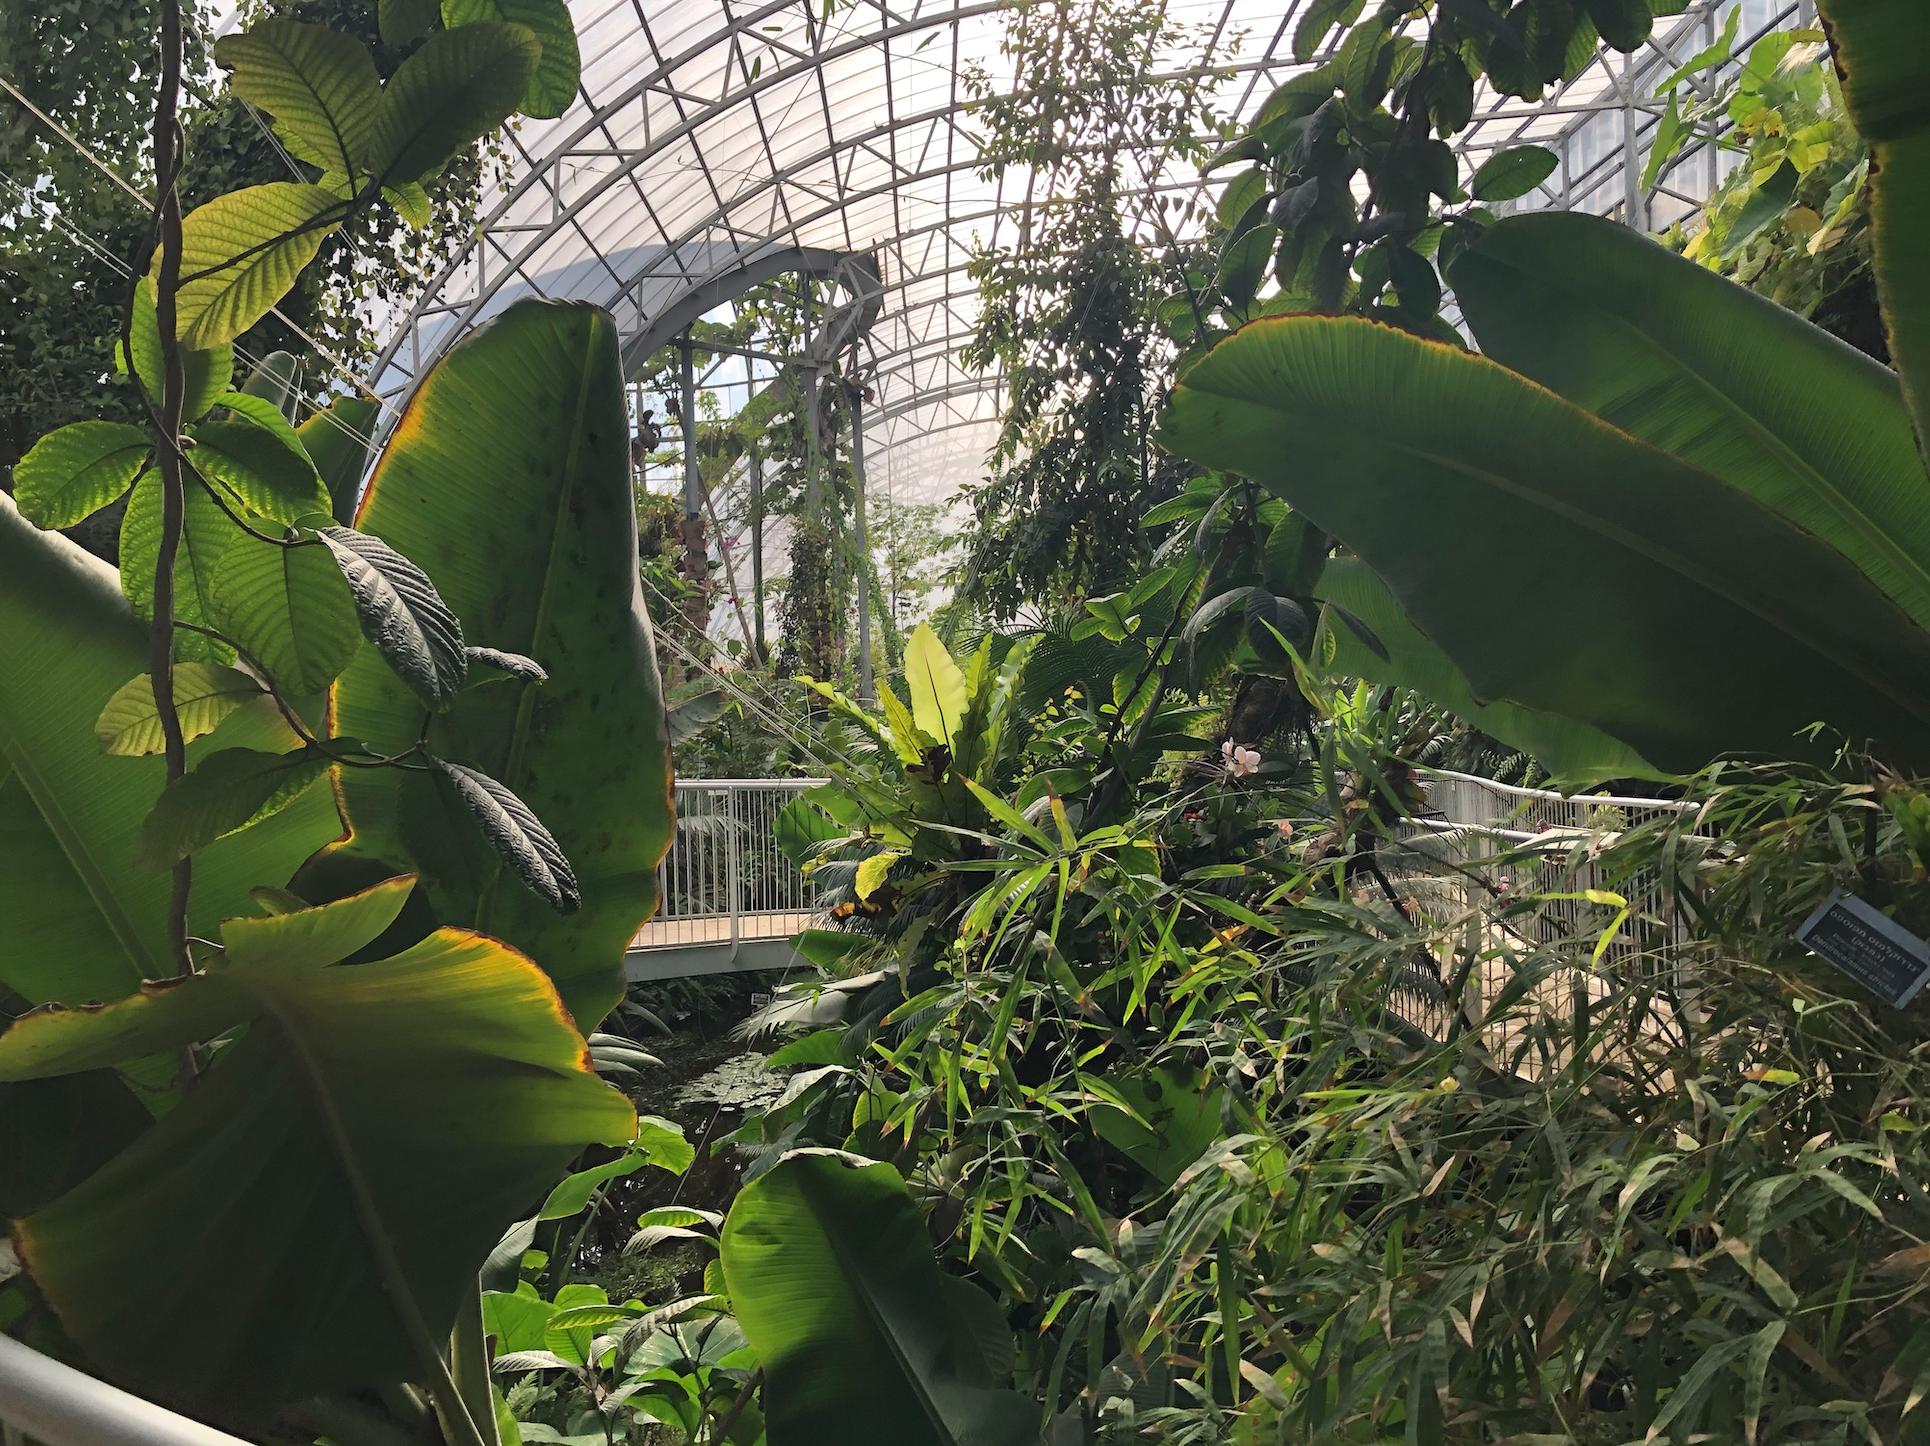 With Rainforest And Rare Species Little Known Jerusalem Garden